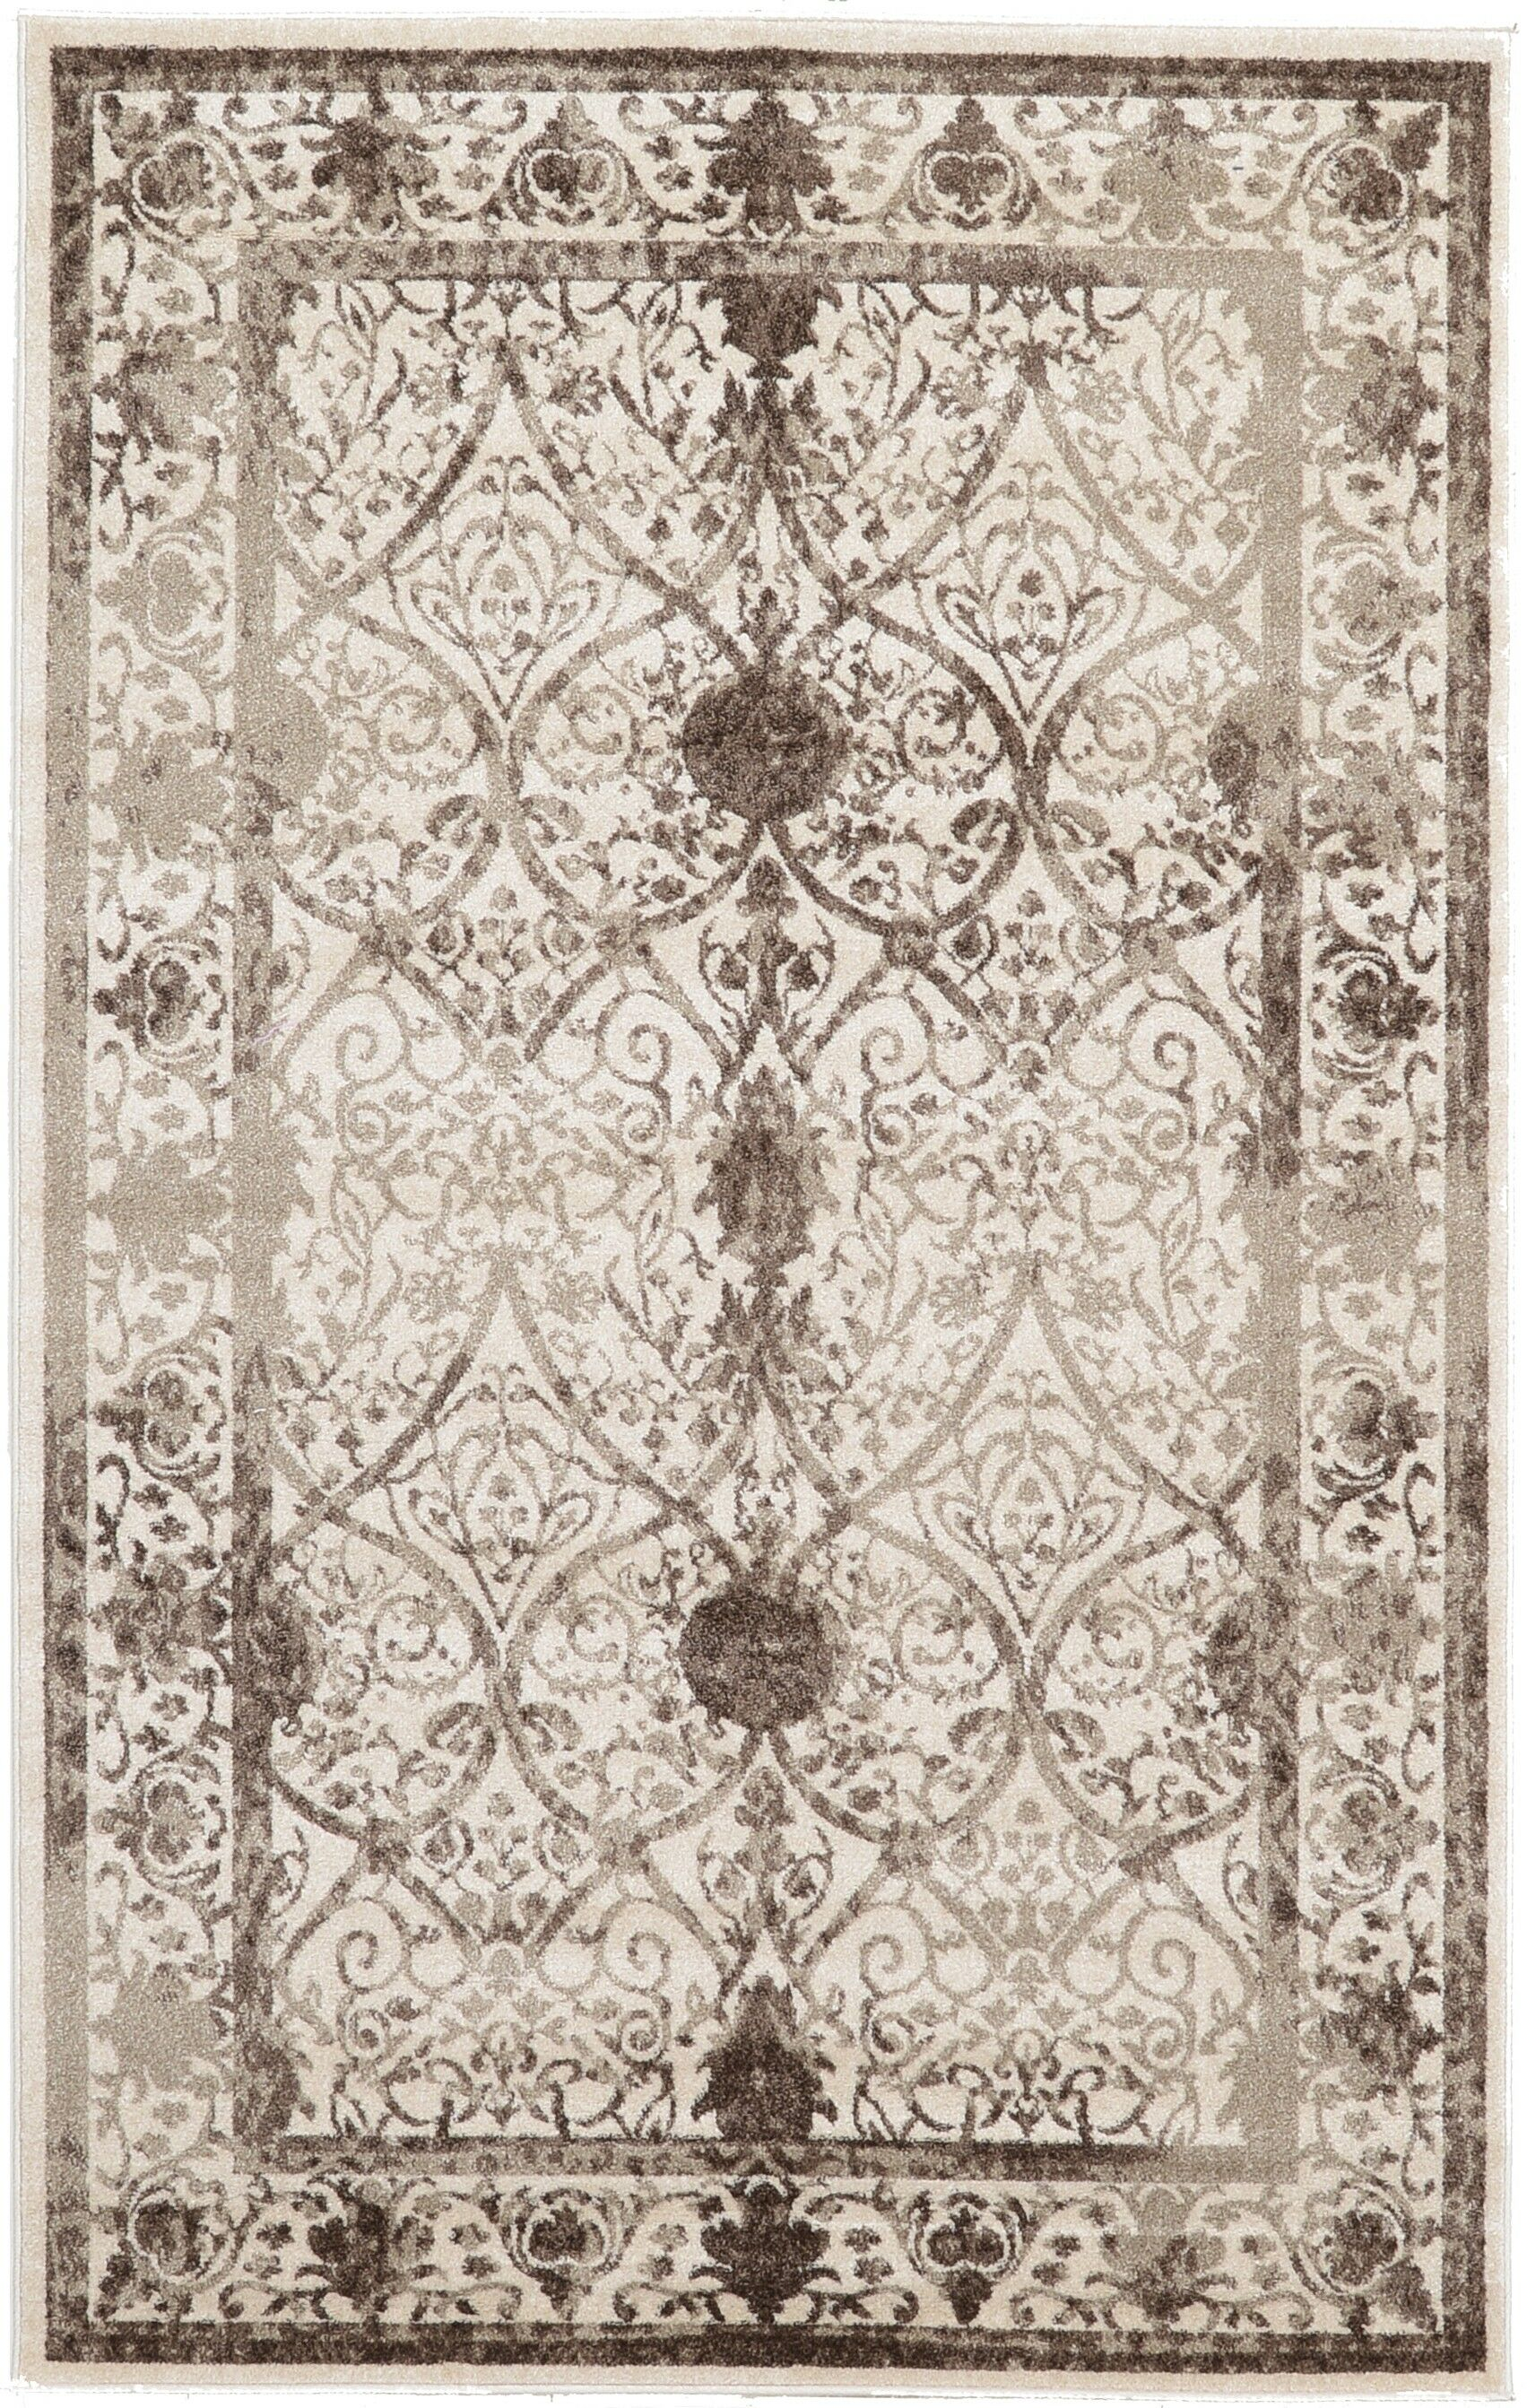 Shailene Power Loom Beige/Brown Indoor Area Rug Rug Size: Rectangle 5' x 8'